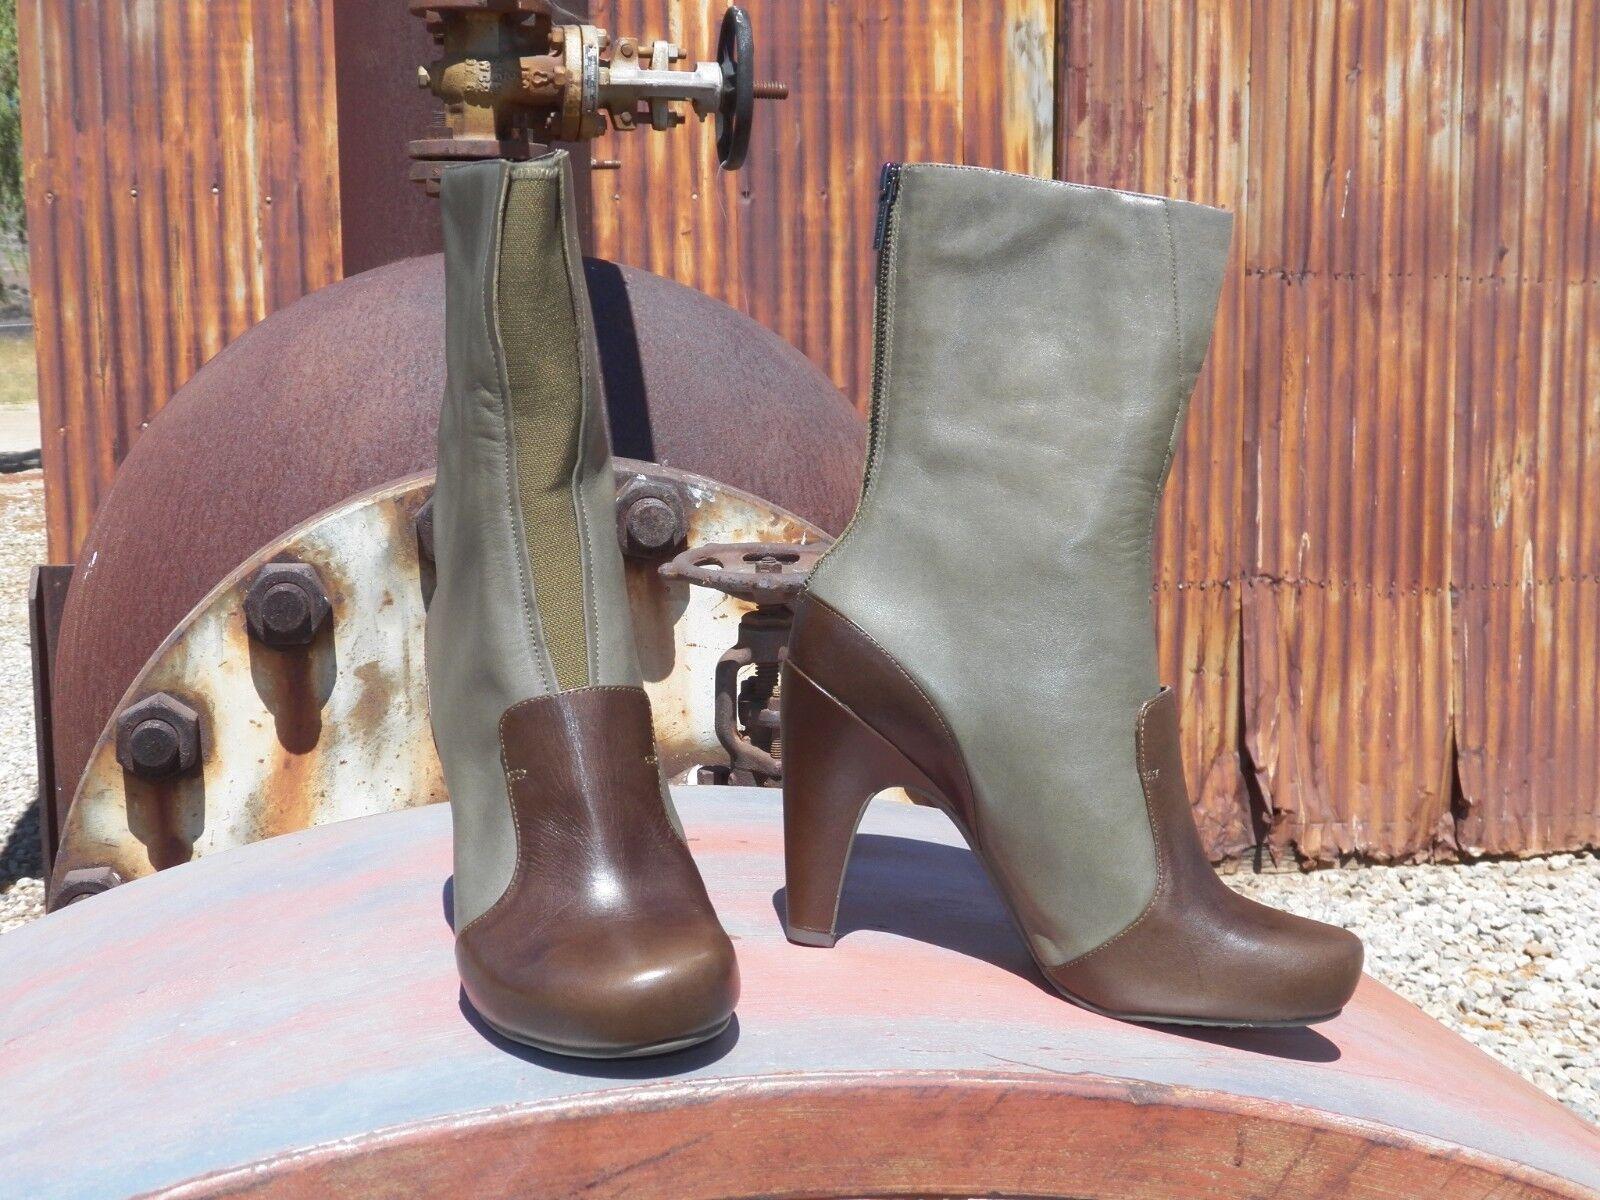 New Damenschuhe Modern Tsubo Emeline Tank Grün Leder Modern Damenschuhe Heel Stiefel All Größes 9ed123